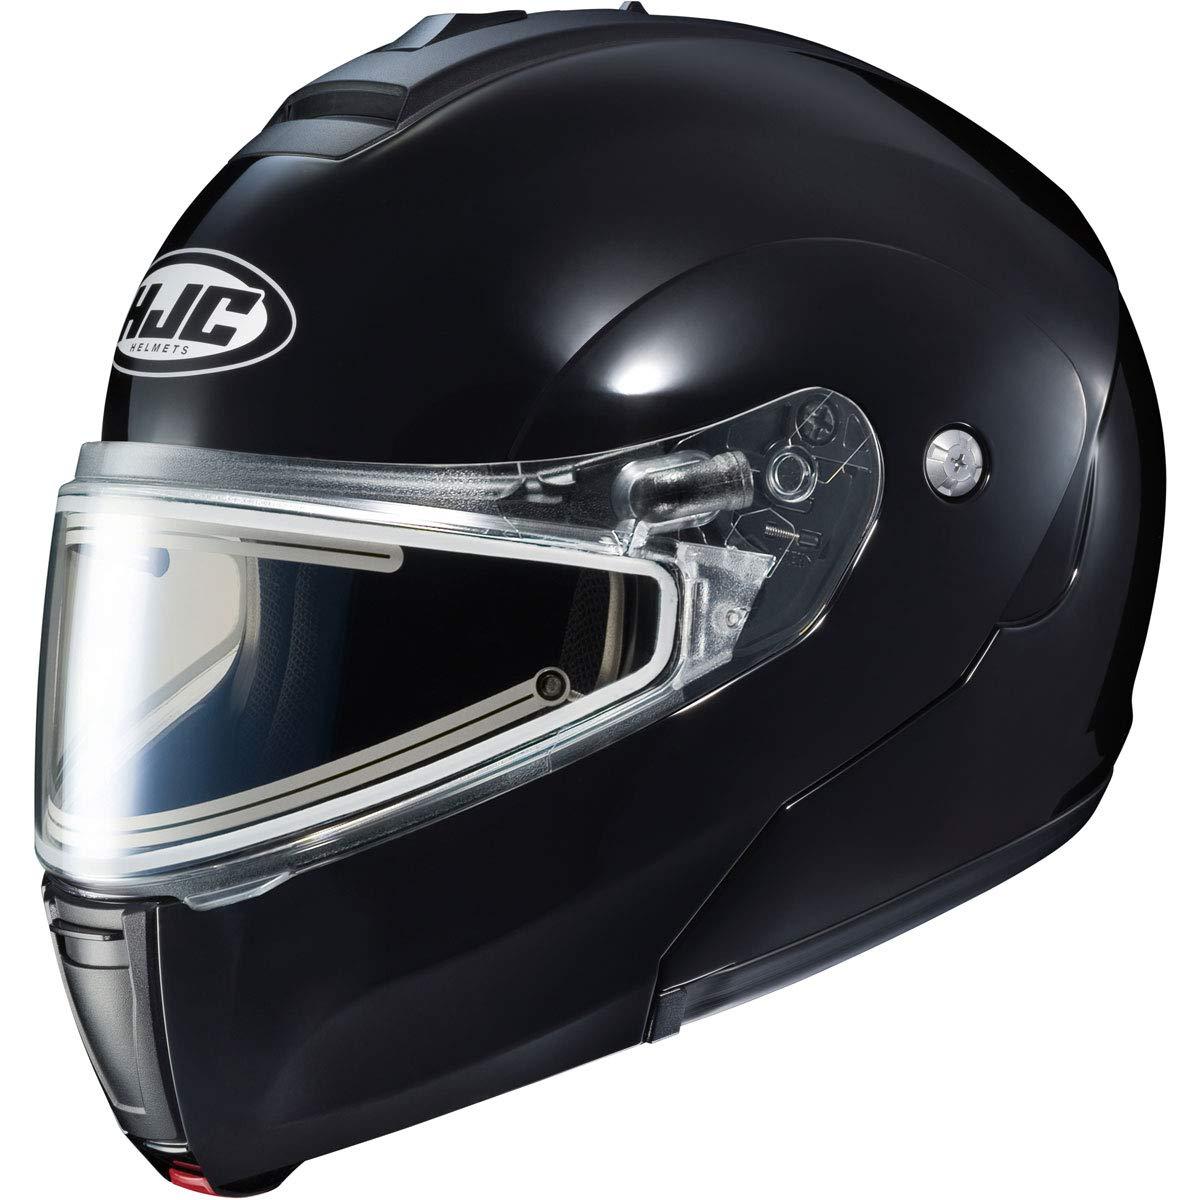 HJC Helmets CL-Max 3 Mens Snowmobile Helmet With Electric Shield Black//X-Large